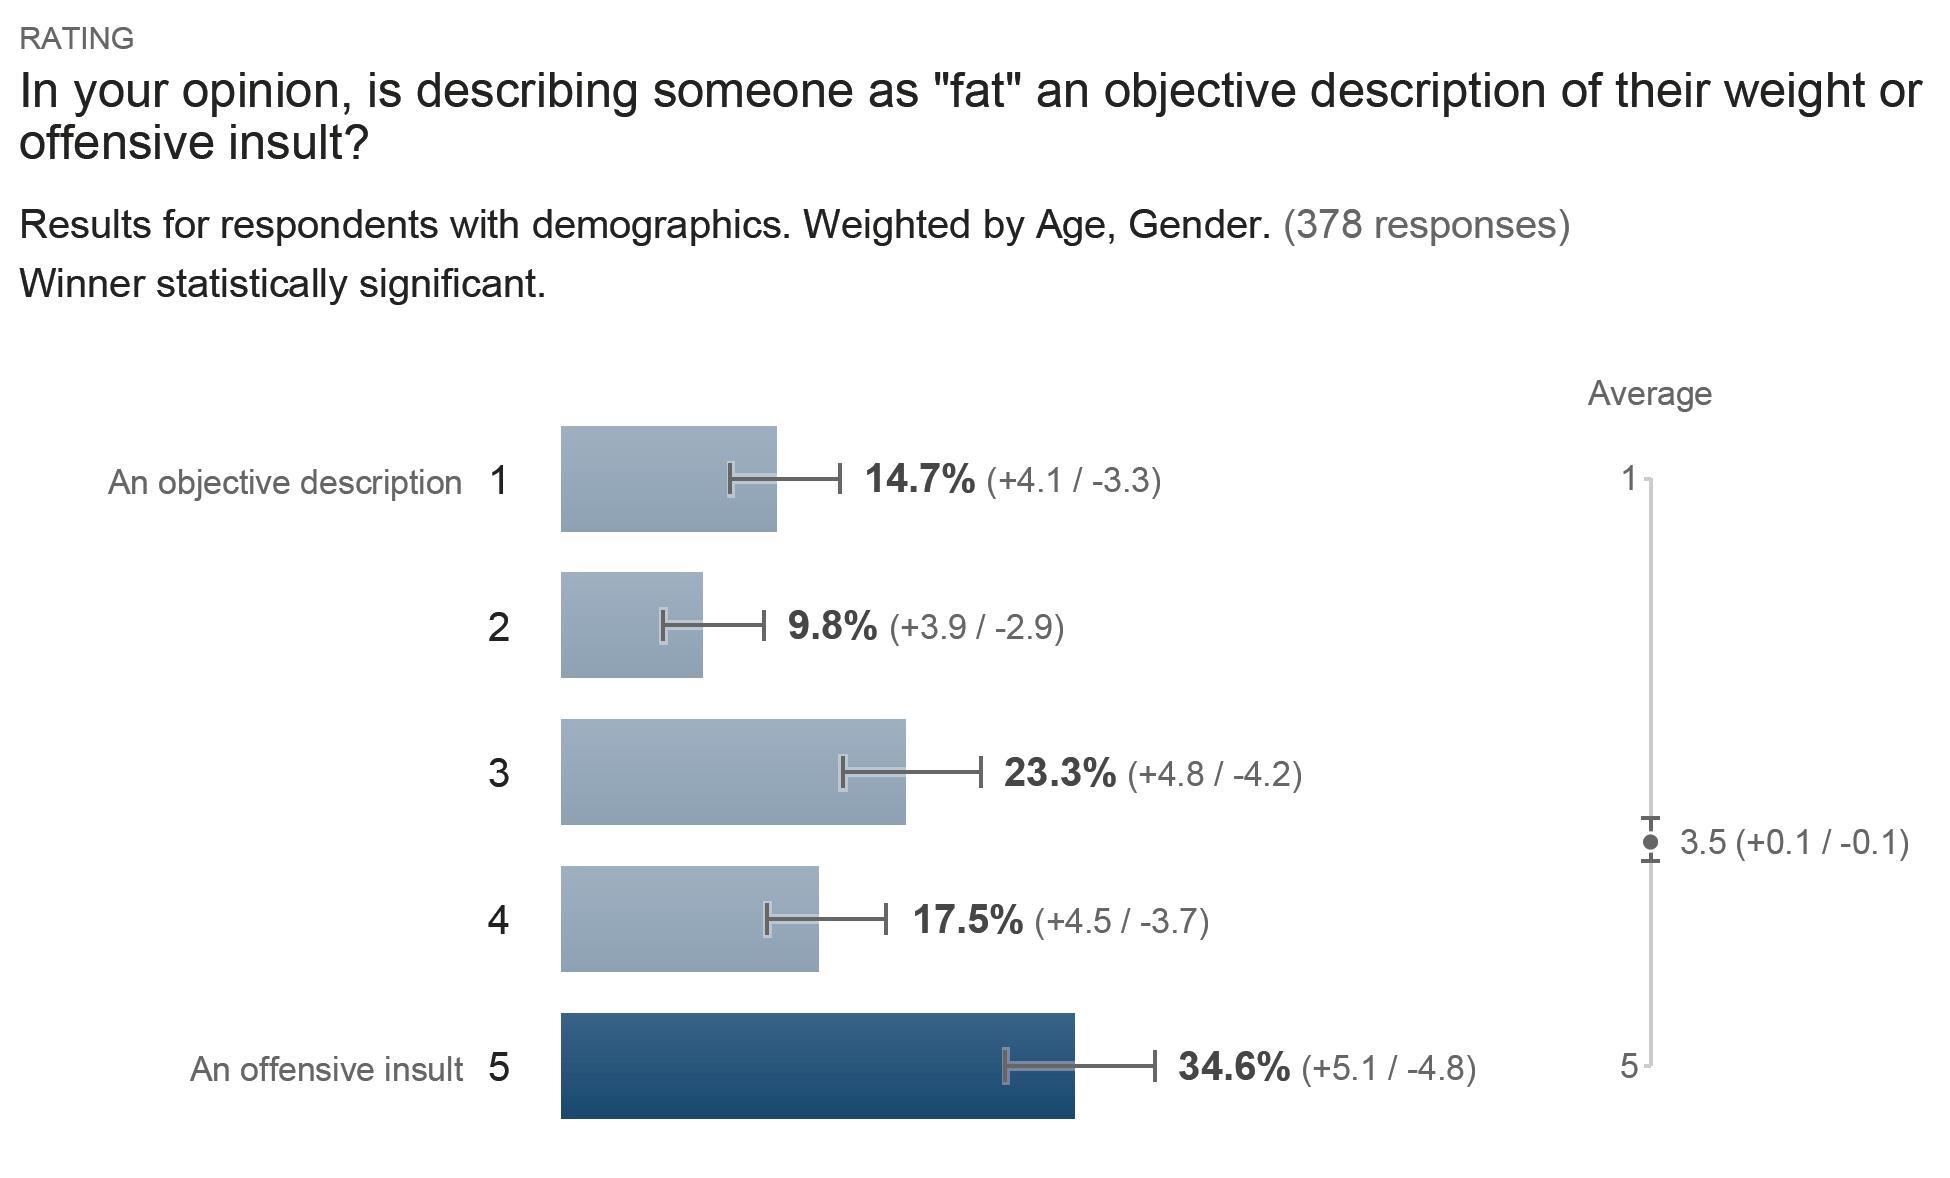 Survey Results - Describing Someone as Fat